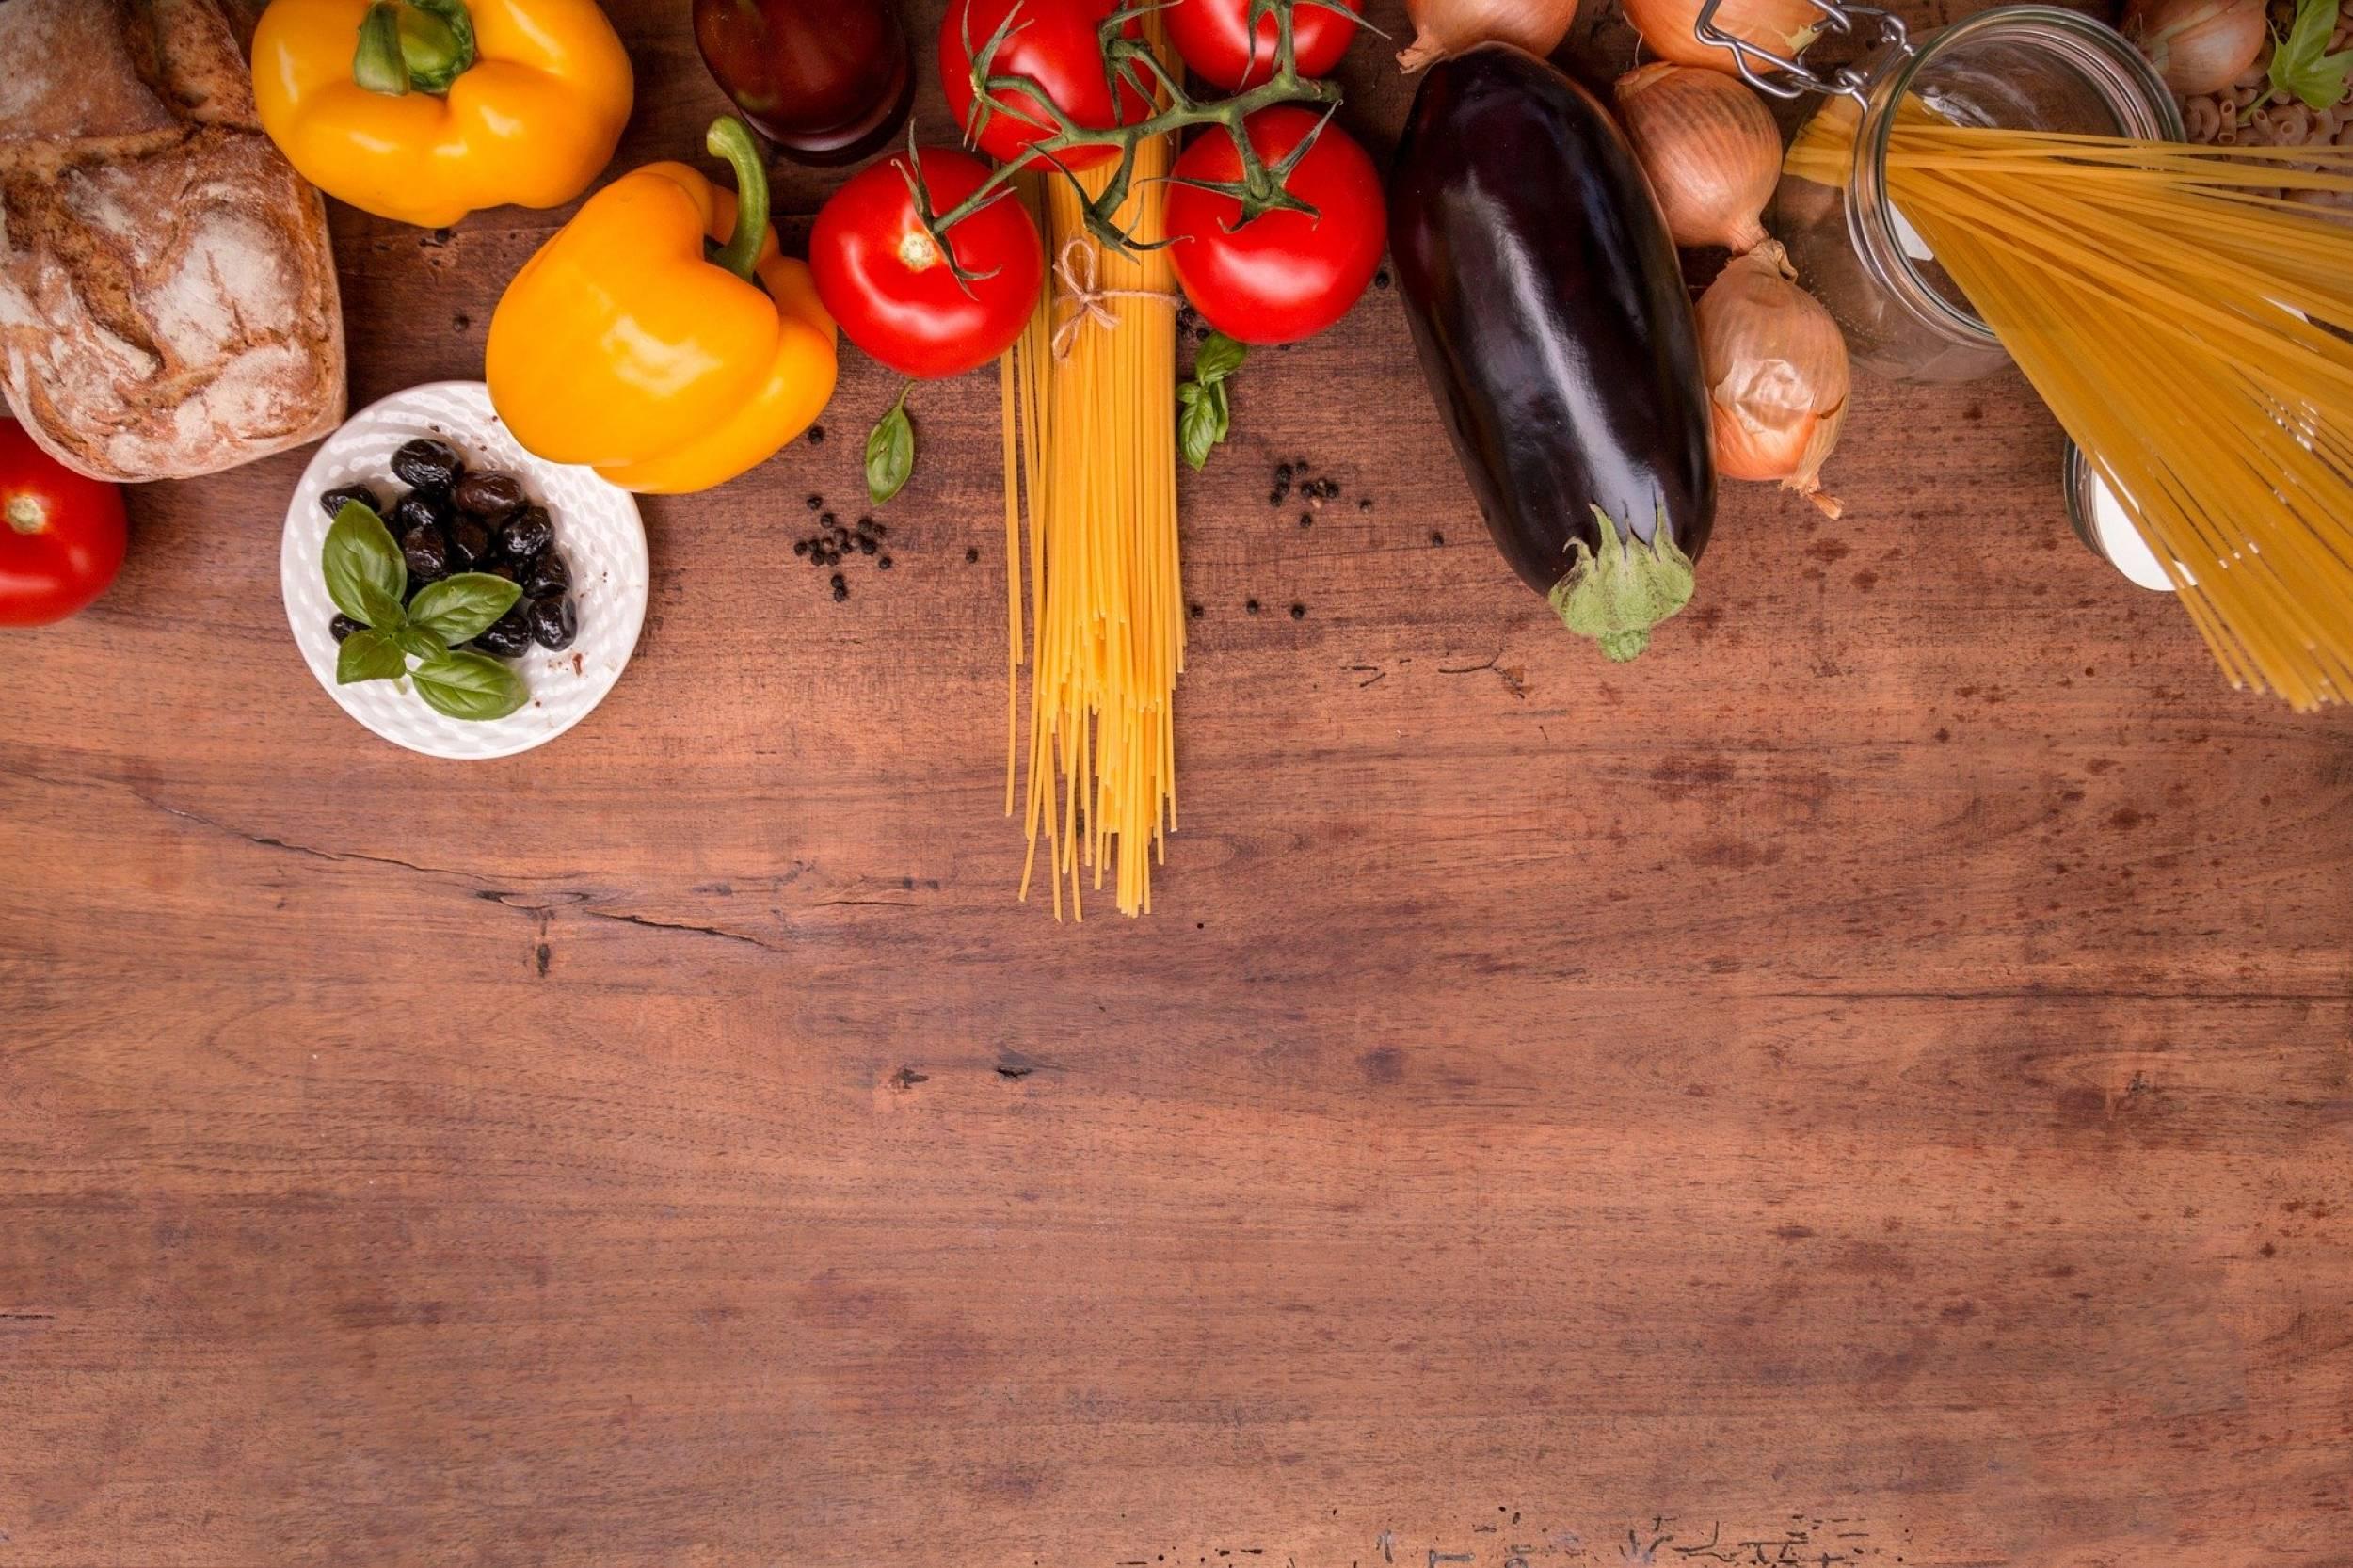 mediterranean-cuisine-2378758_1920